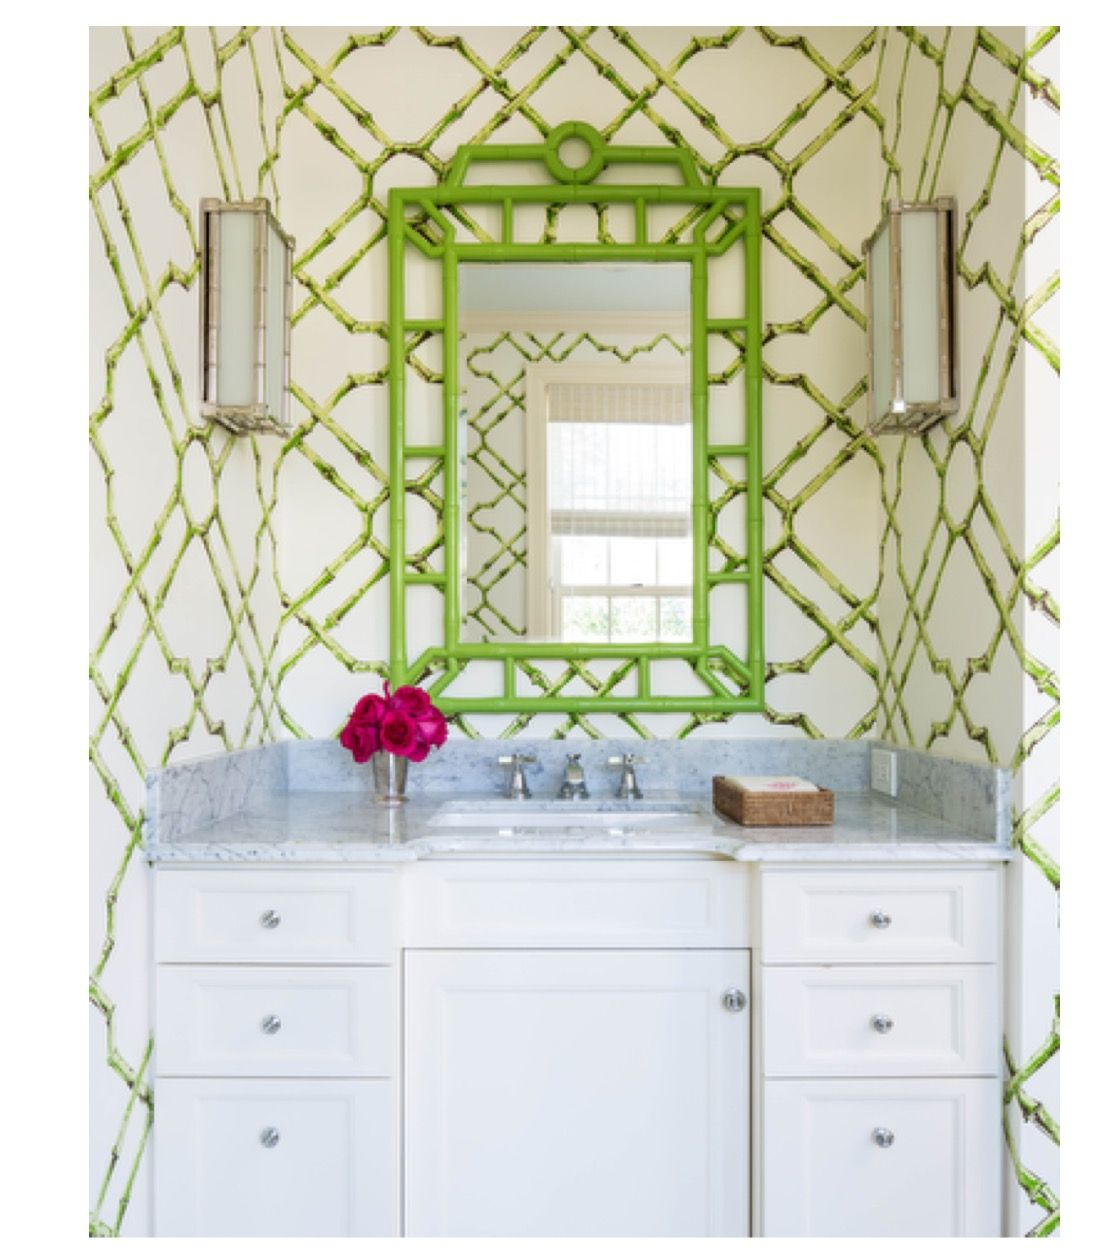 Meg Braff Wallpaper Brighton Your Pavilion Powder Room Design Wallpaper Dutch Tiles